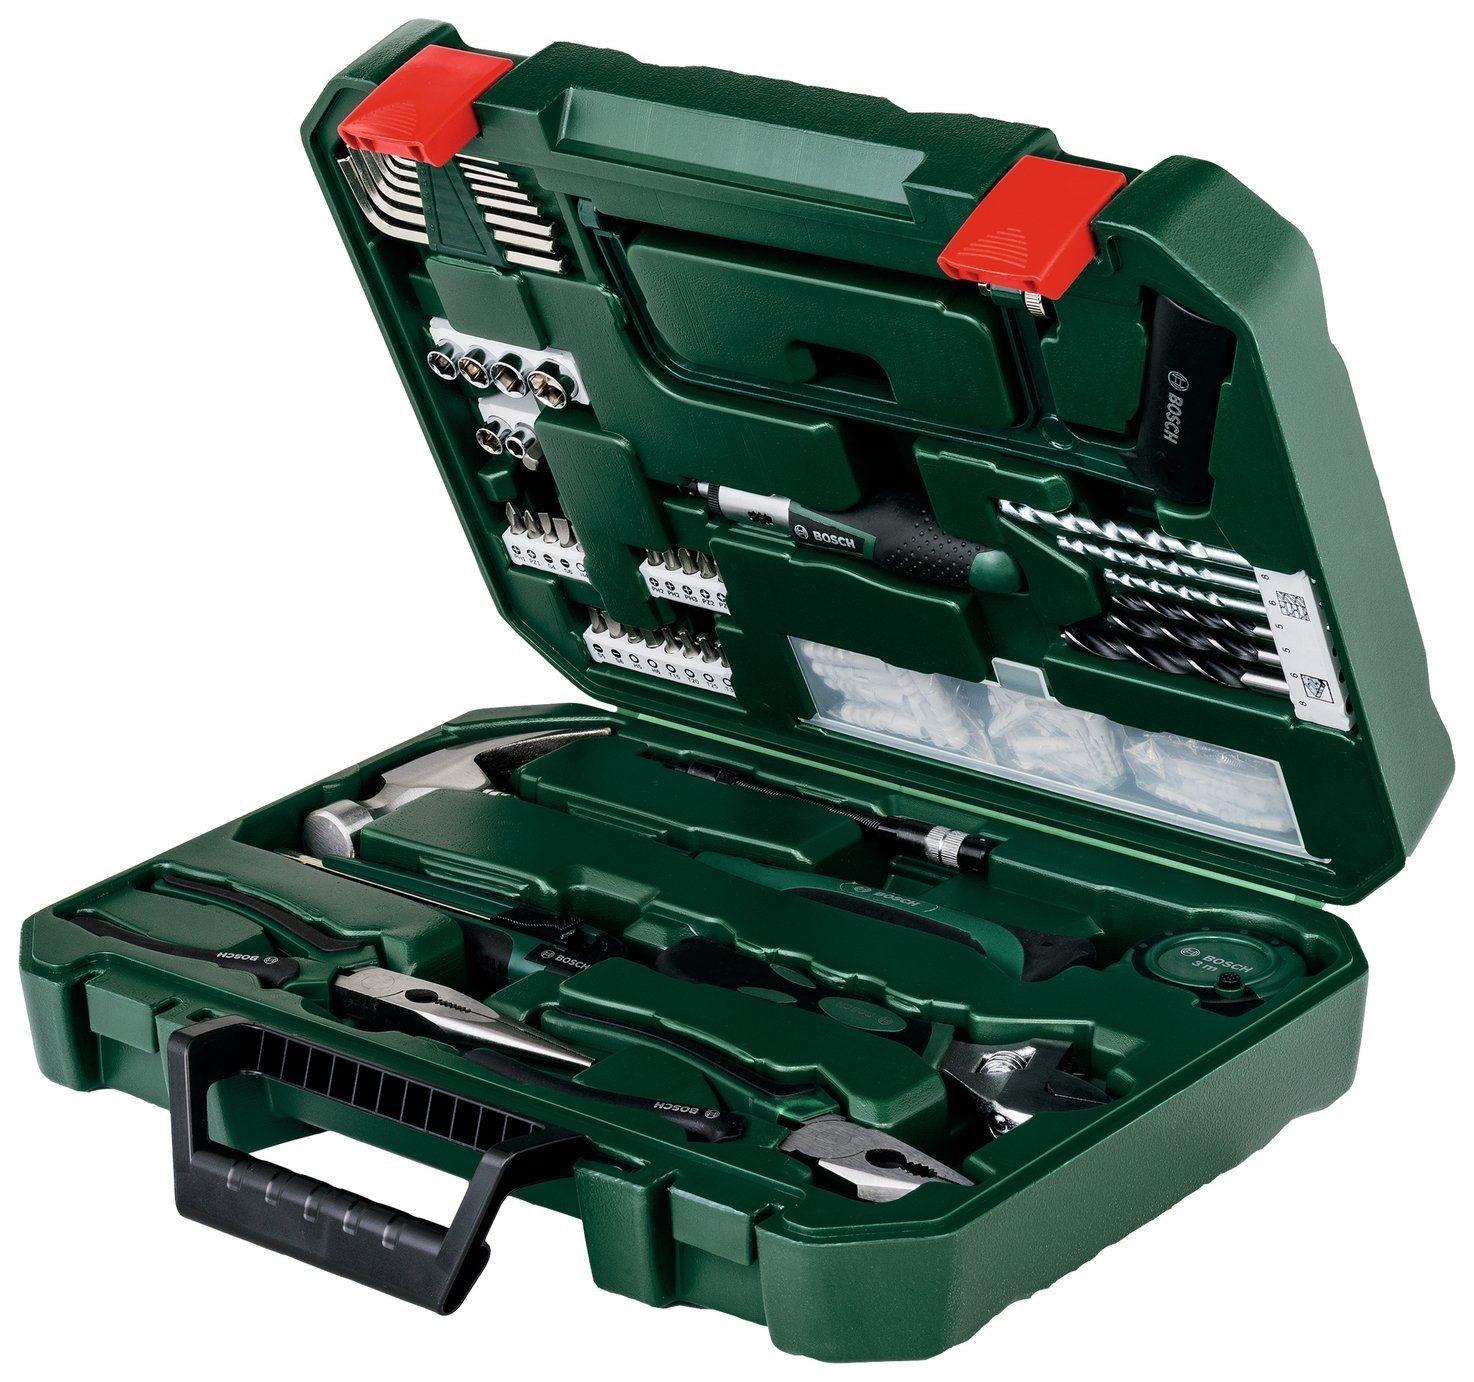 Bosch 111 Piece Hand Tool Kit Set, Home DIY, £29.99 + Free Delivery @ Argos/eBay